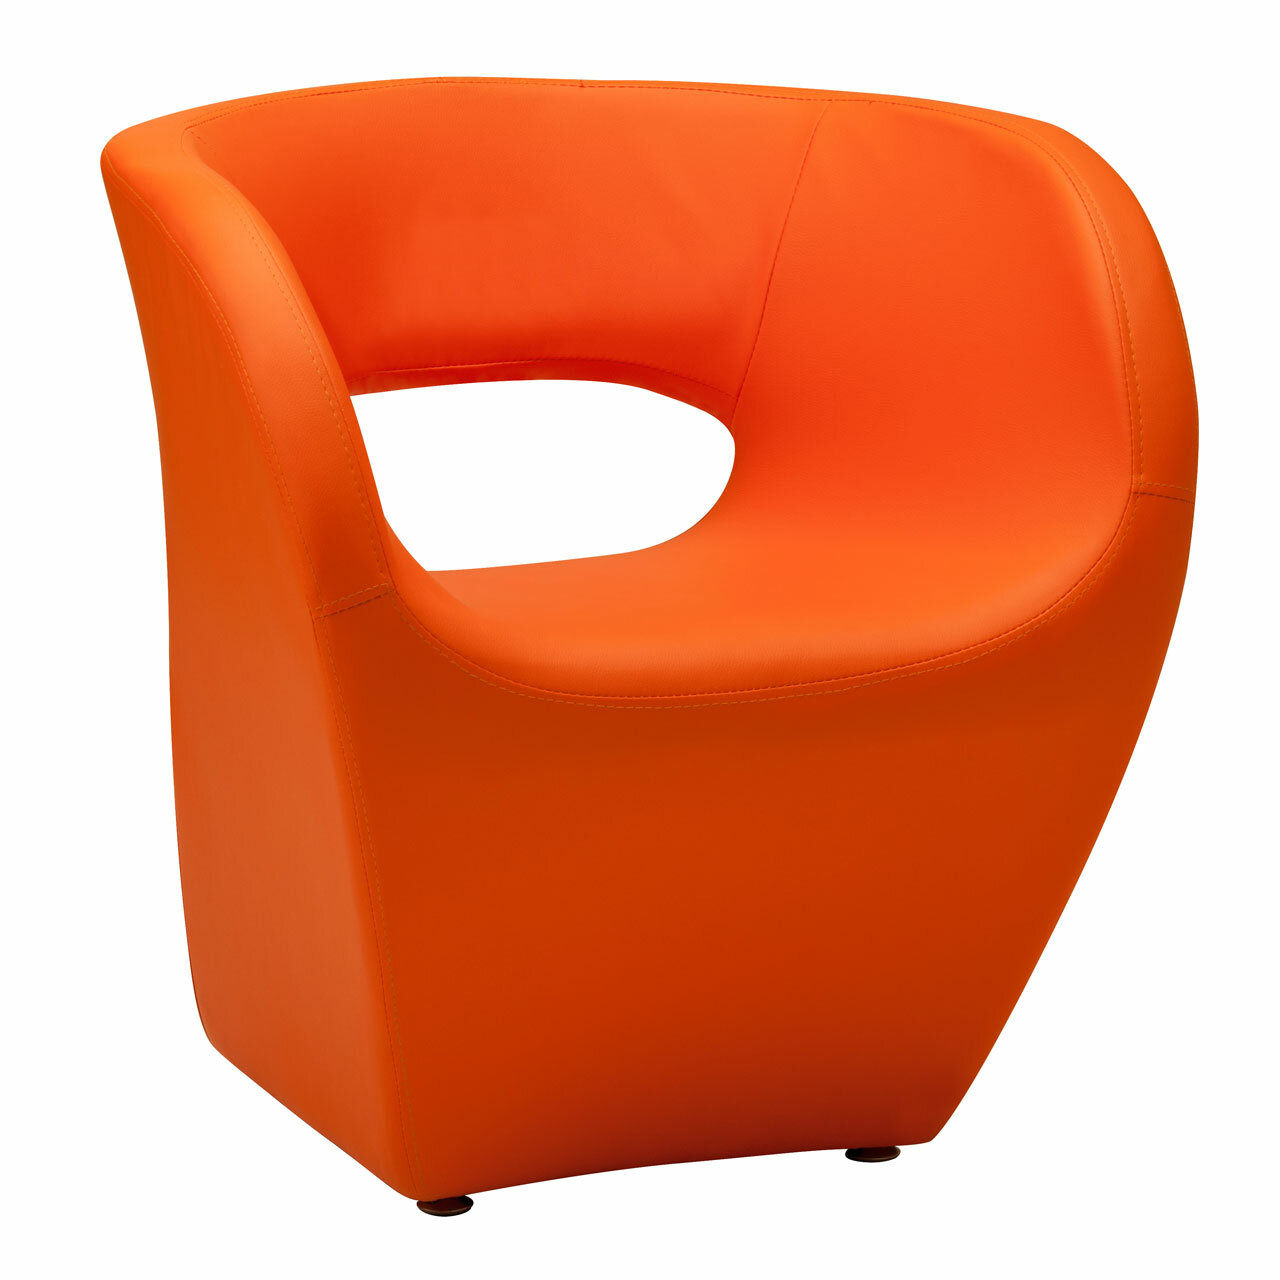 All Home Aldo Tub Chair & Reviews | Wayfair.co.uk